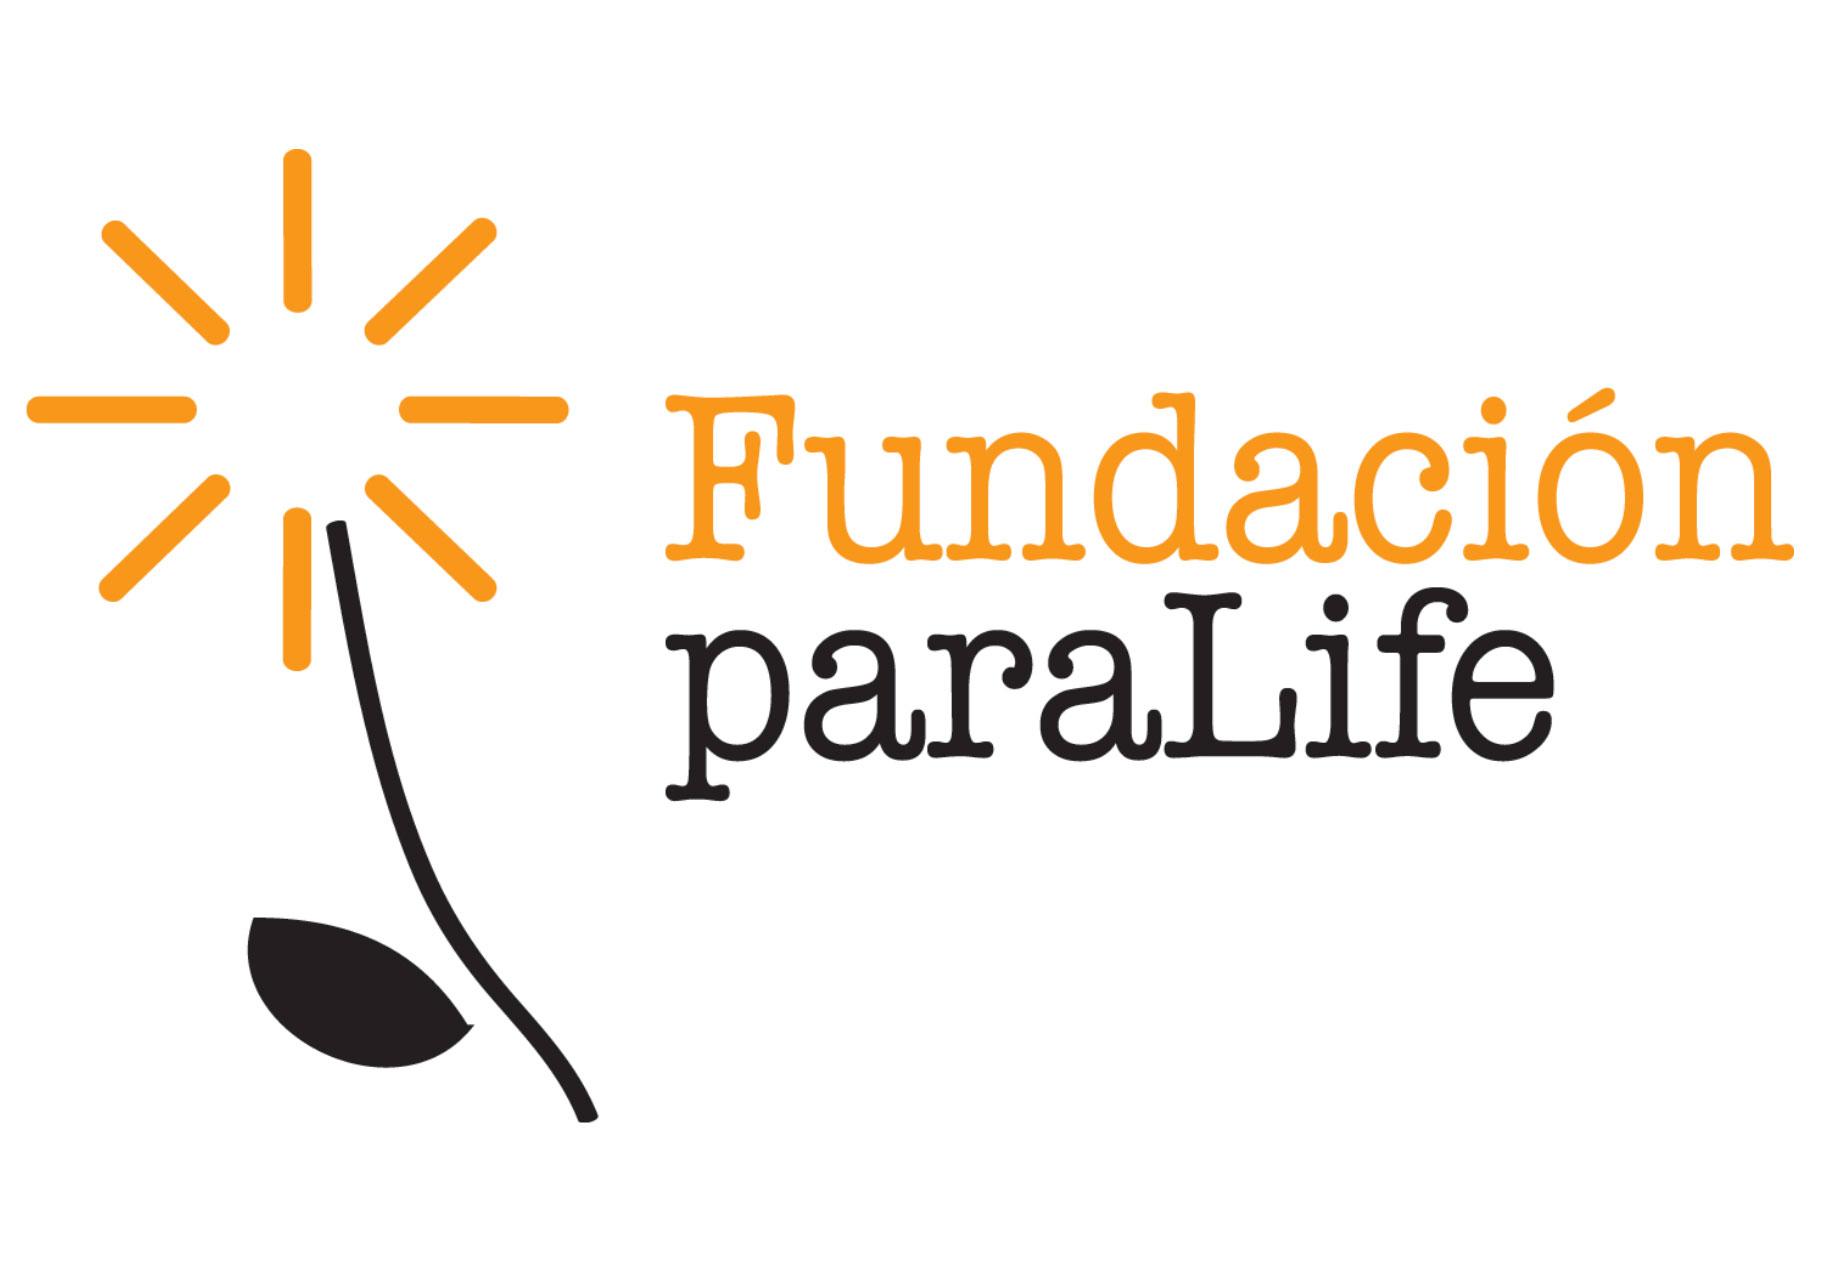 Fundacion Paralife